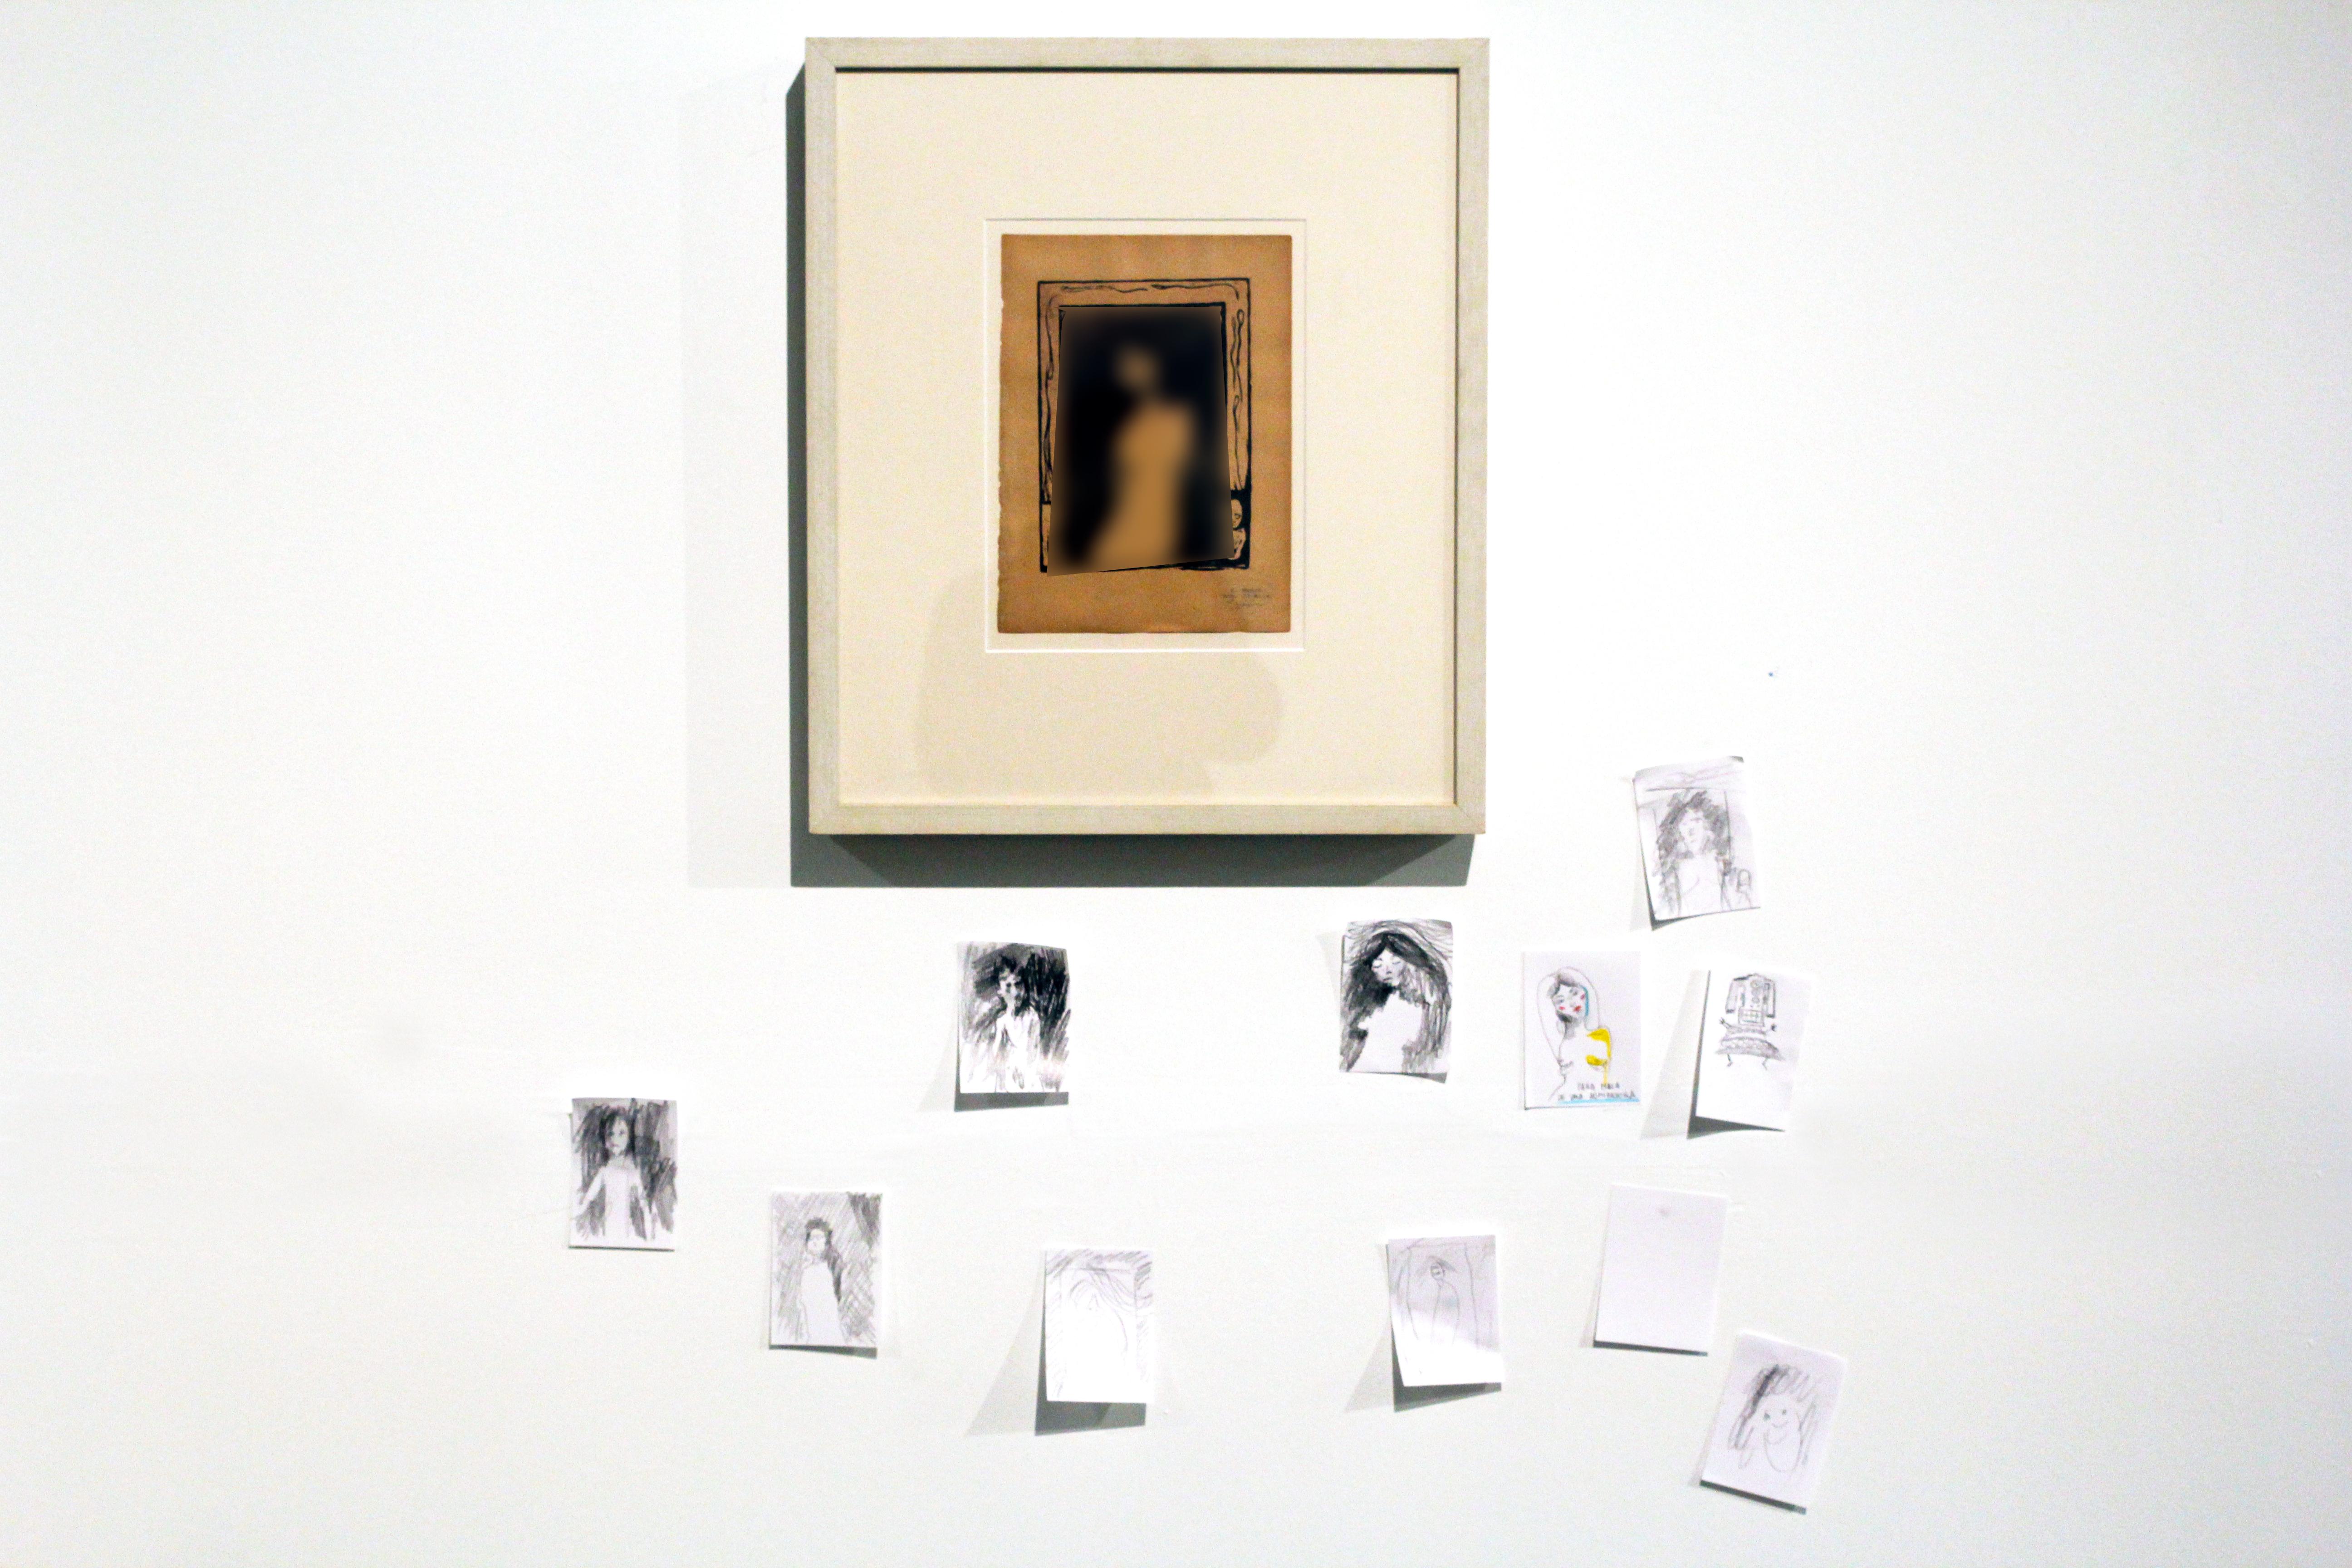 Cepeda, Miguel Ángel. 2015. Munch 5.